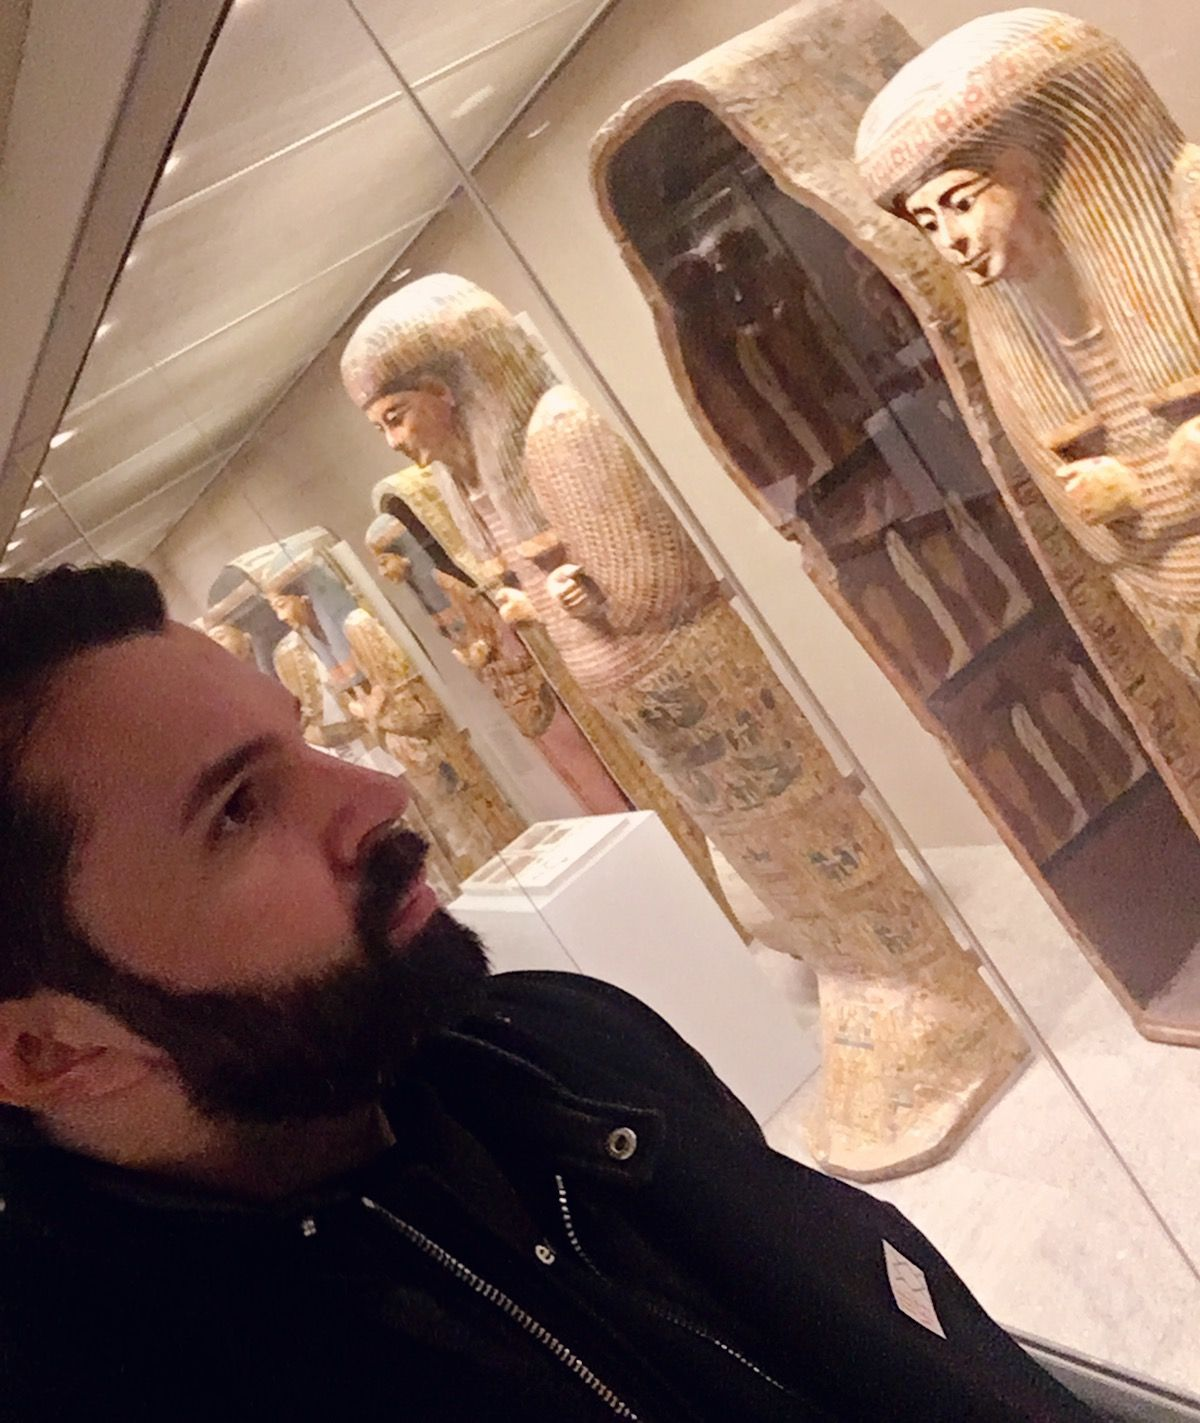 Pai daca nici la New York, nu merg la muzeu...atunci unde?! 🗽🏛🏙🇺🇸🔝#newyork #metropolitanmuseumofart #holiday #xmas #me #happy #doctor #doctorlazarescu #drlazarescu www.doctorlazarescu.ro